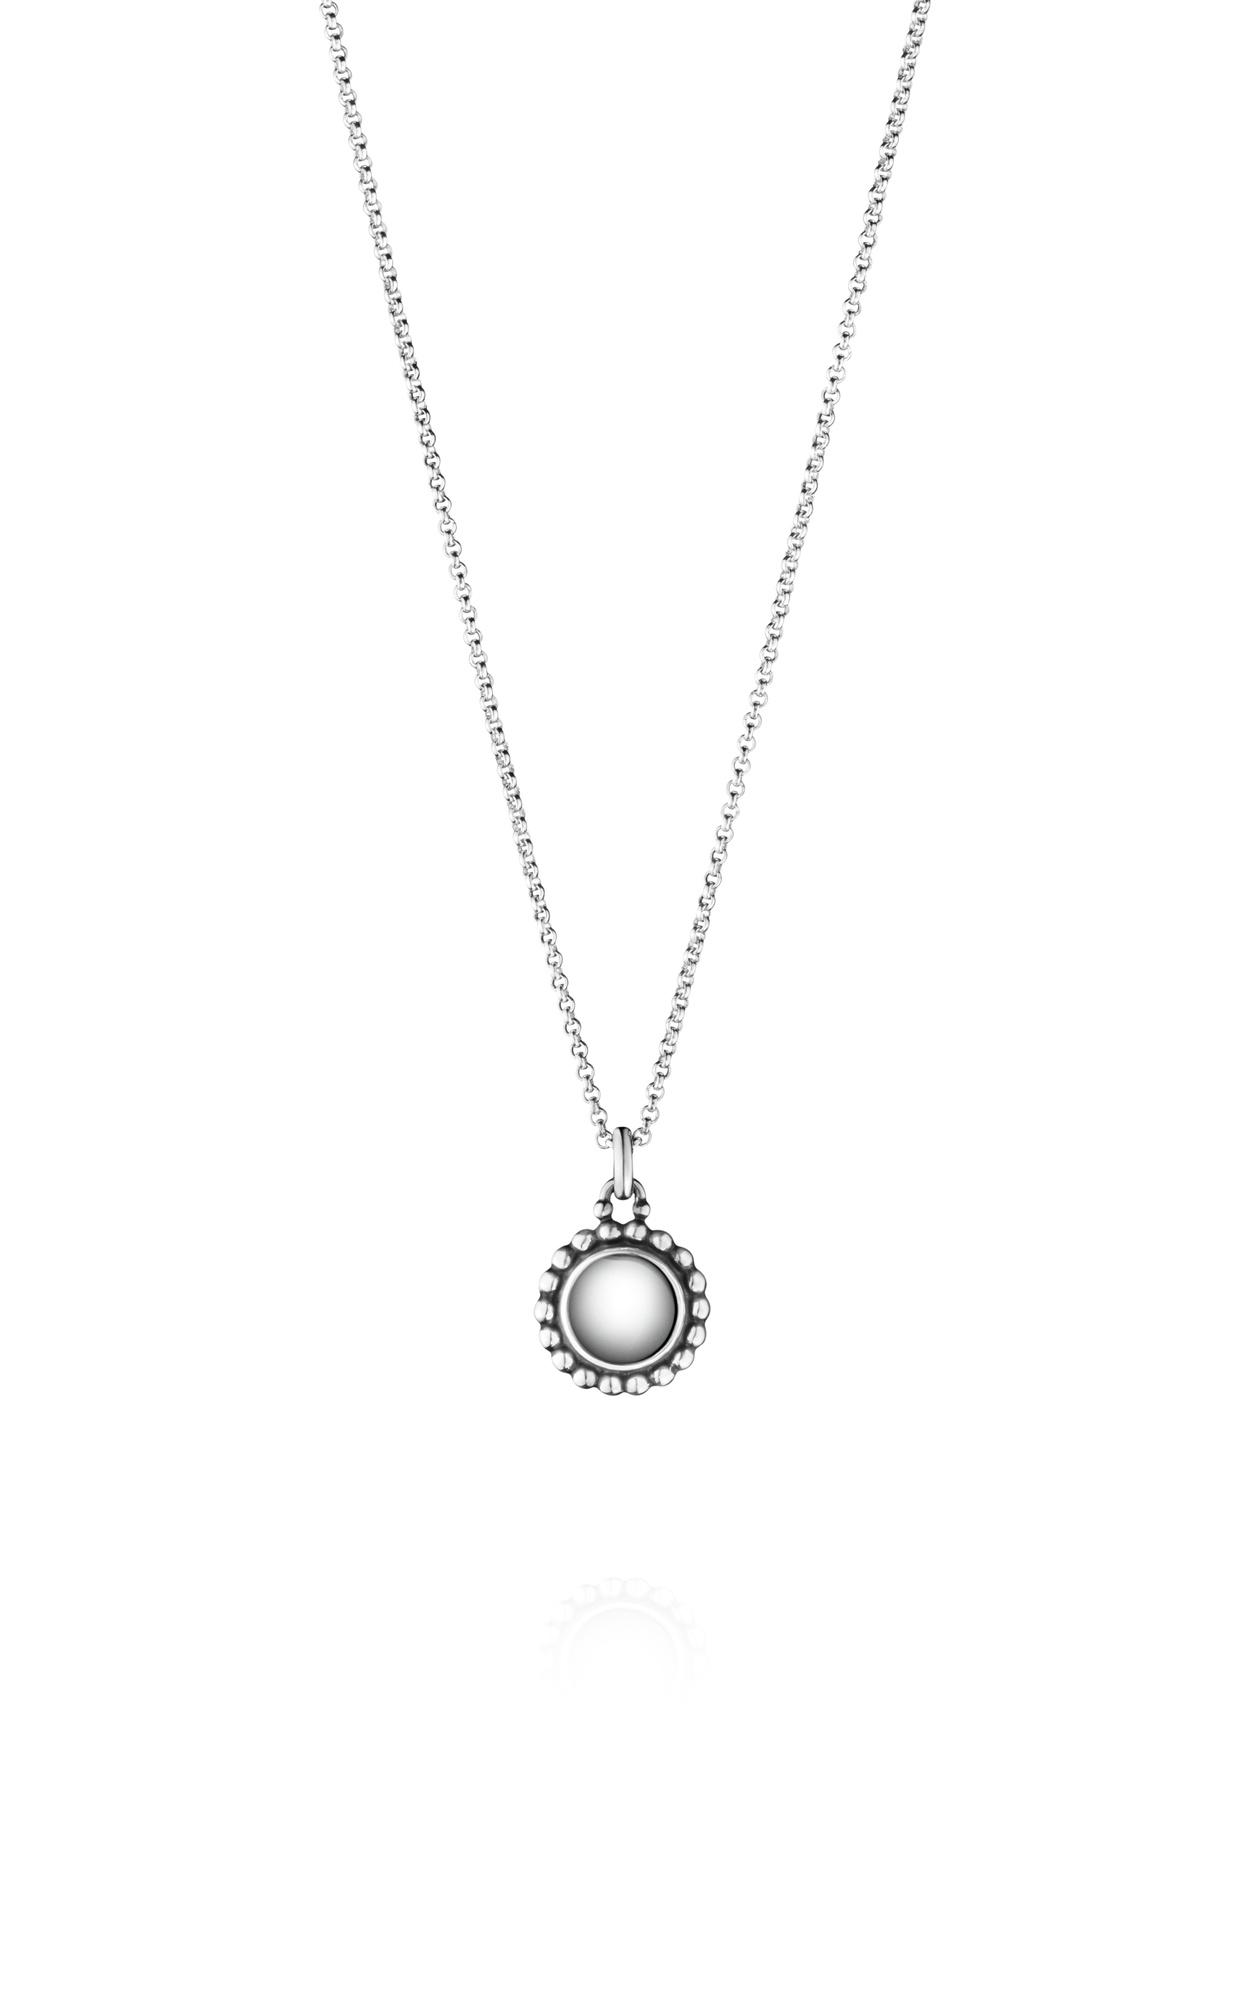 Georg Jensen moonlight blossom silver long pendant